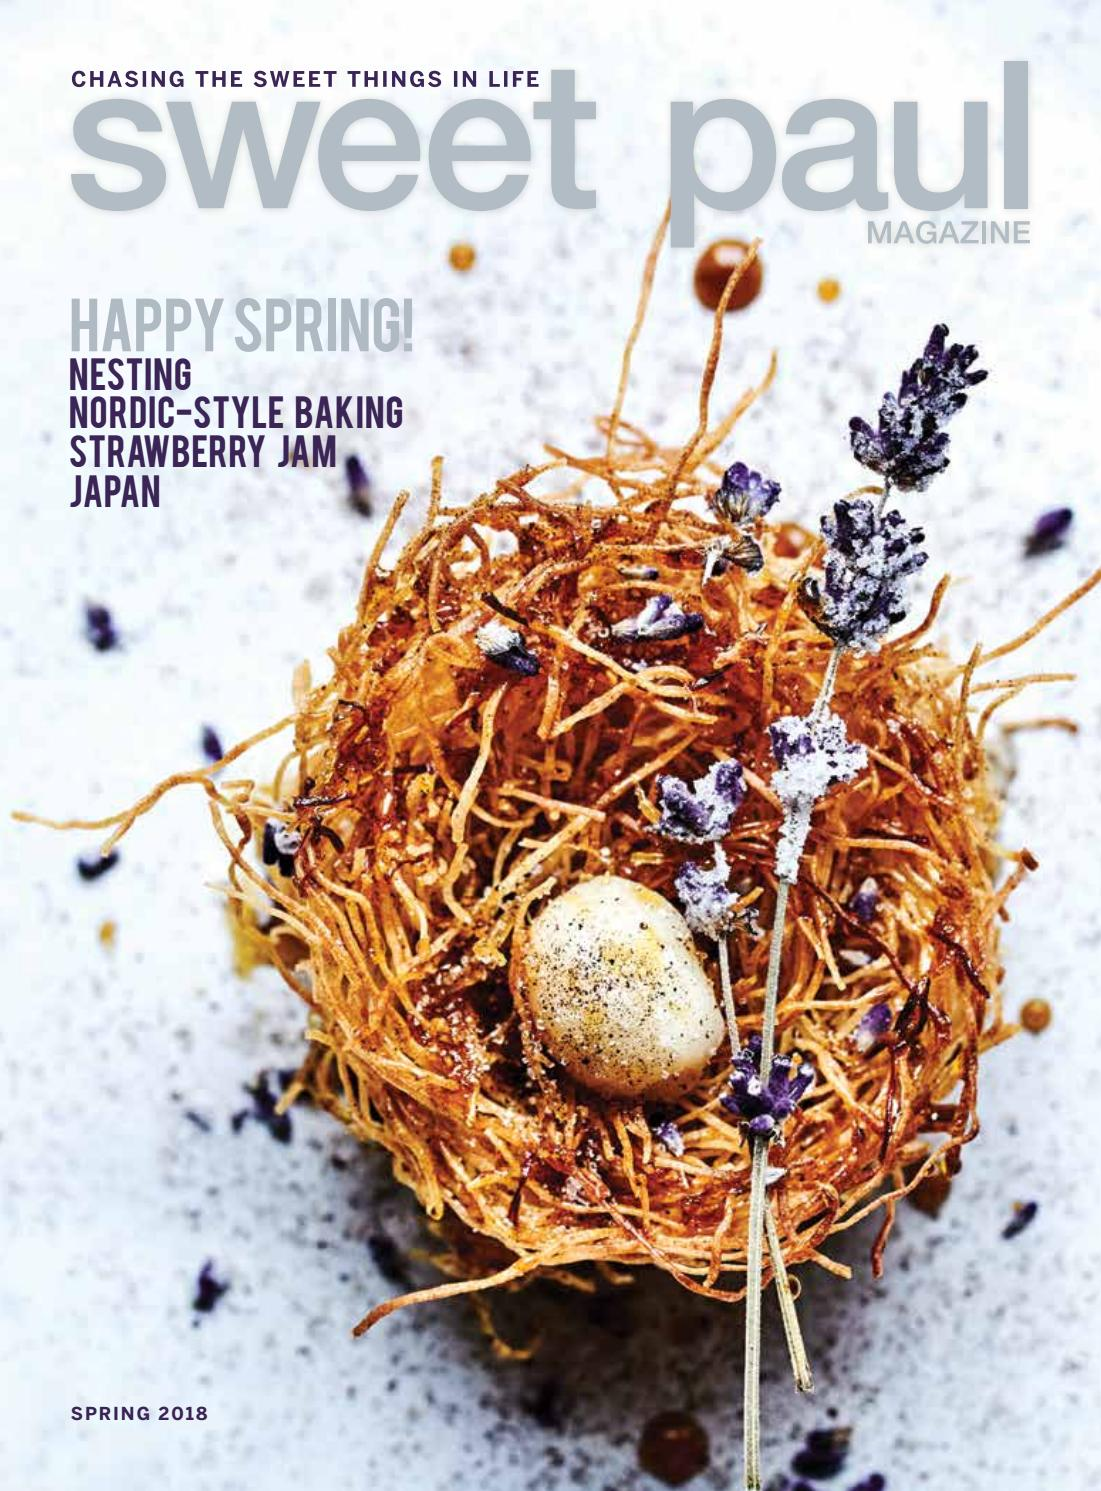 Sweet Paul #32 - Spring 2018 by Sweet Paul Magazine - issuu